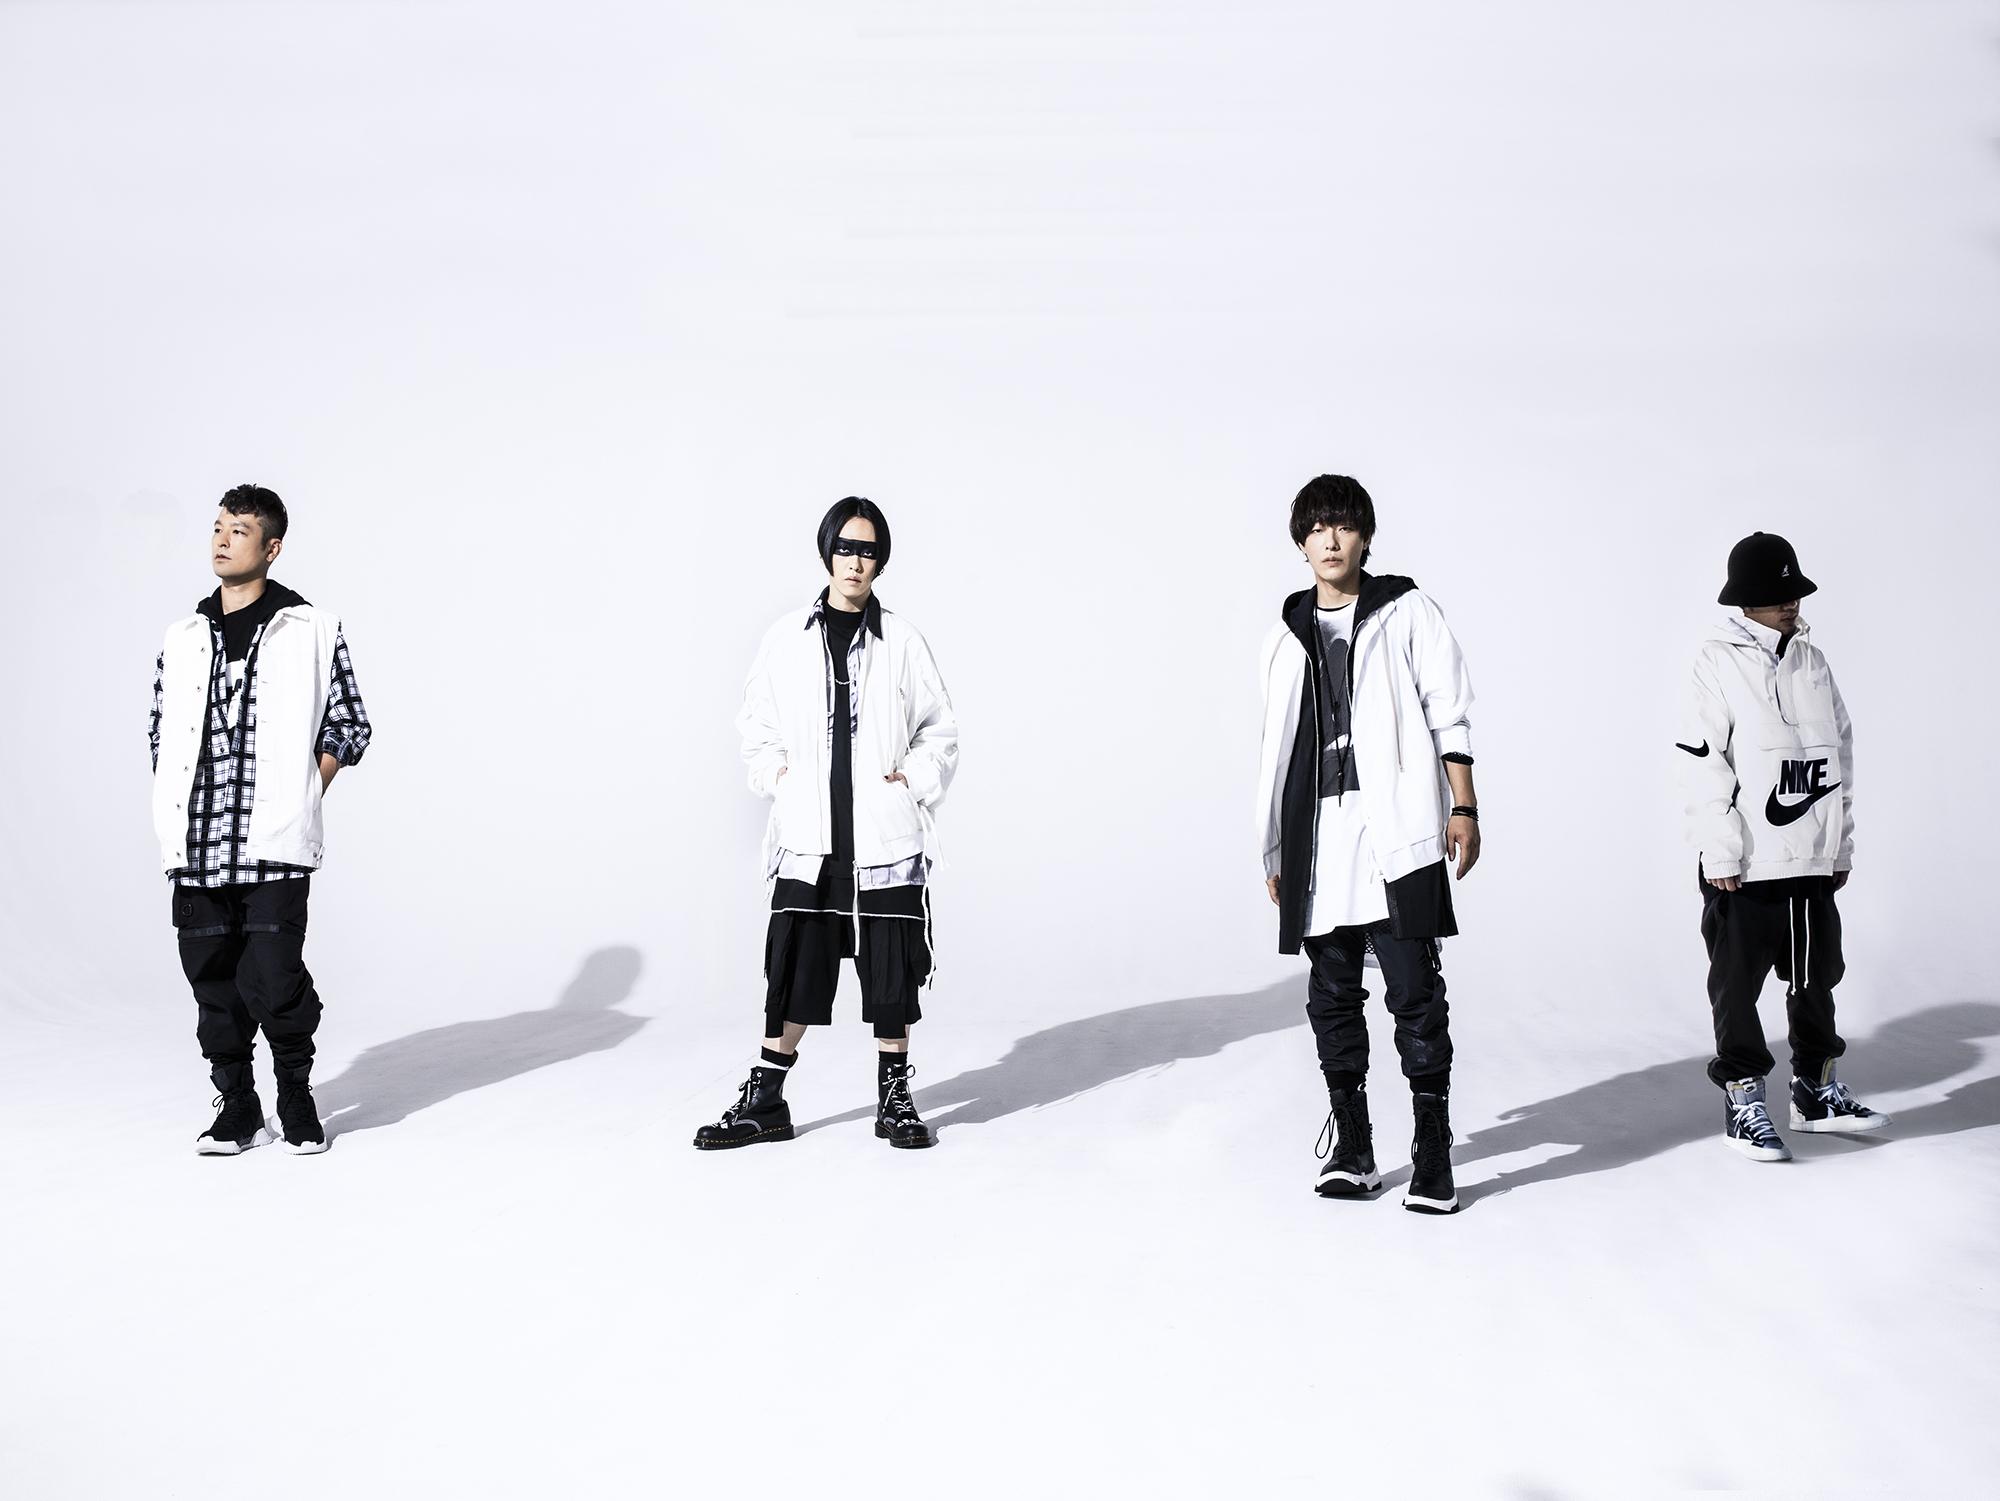 SPYAIRデビュー10周年、新ビジュアル公開&11月にシングルCD発売決定